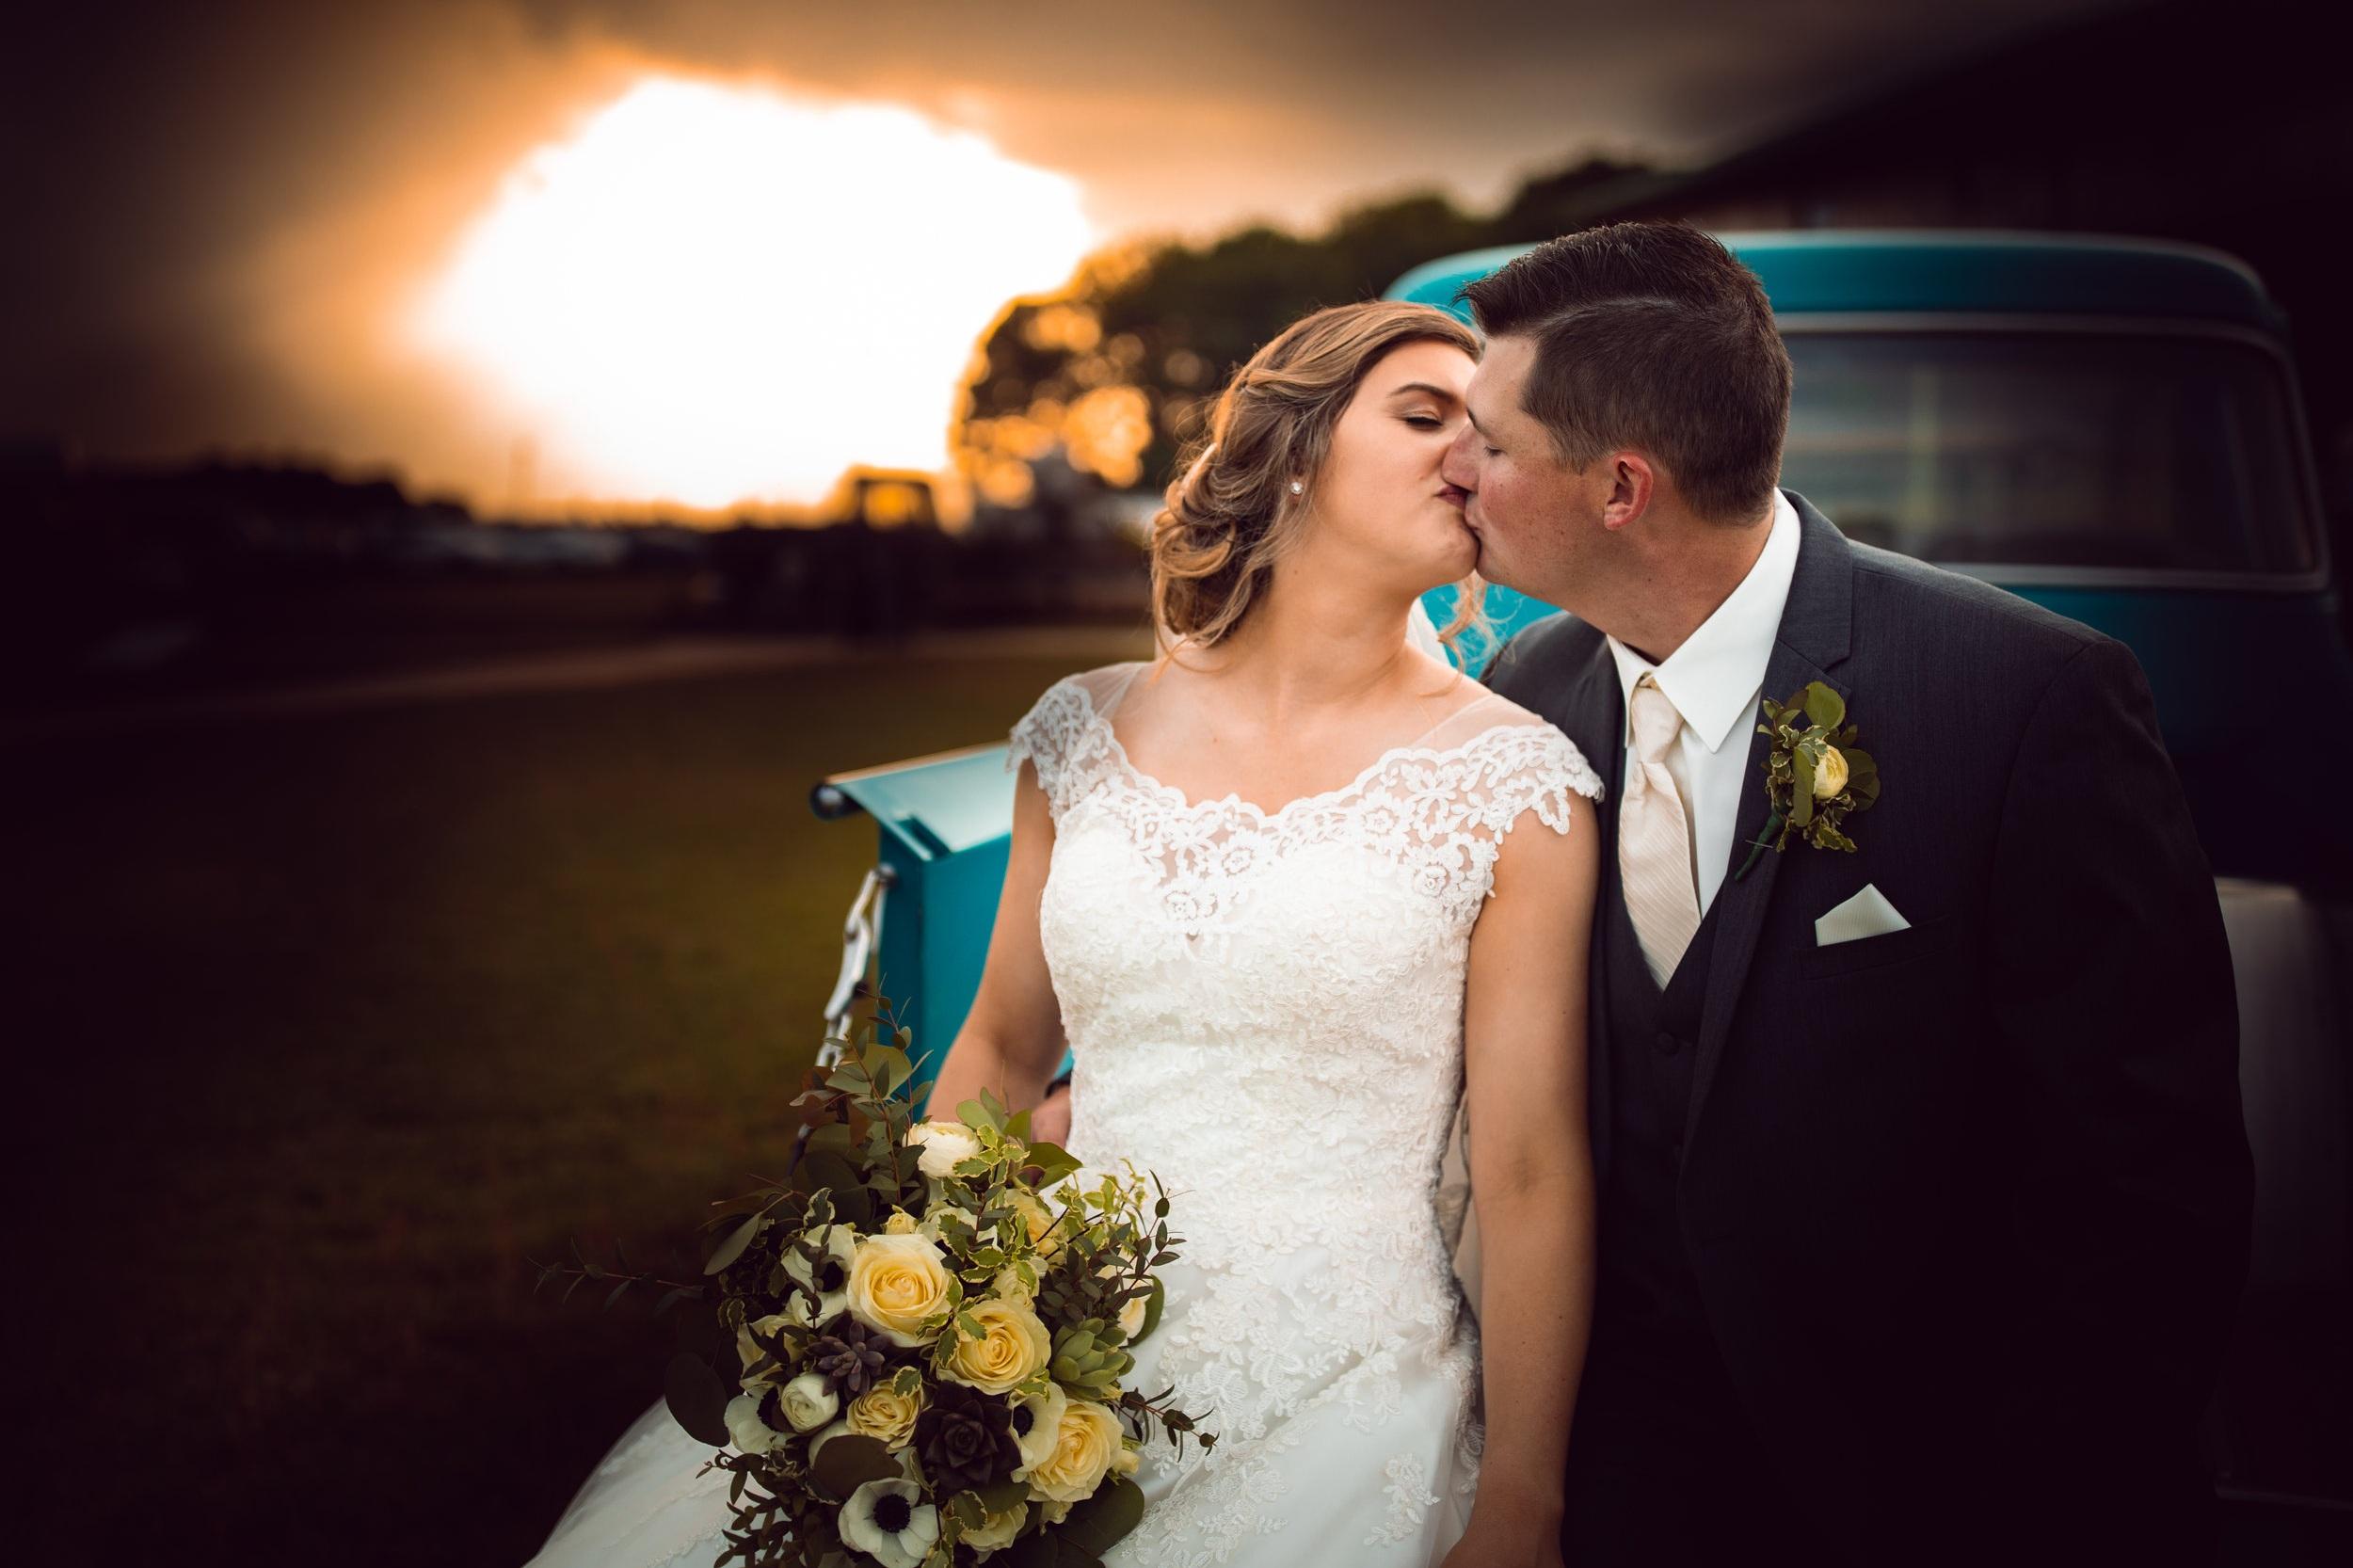 randi-schuette-photo-the-barn-at-heritage-farm-nc-wedding-edwards-portraits92.jpg